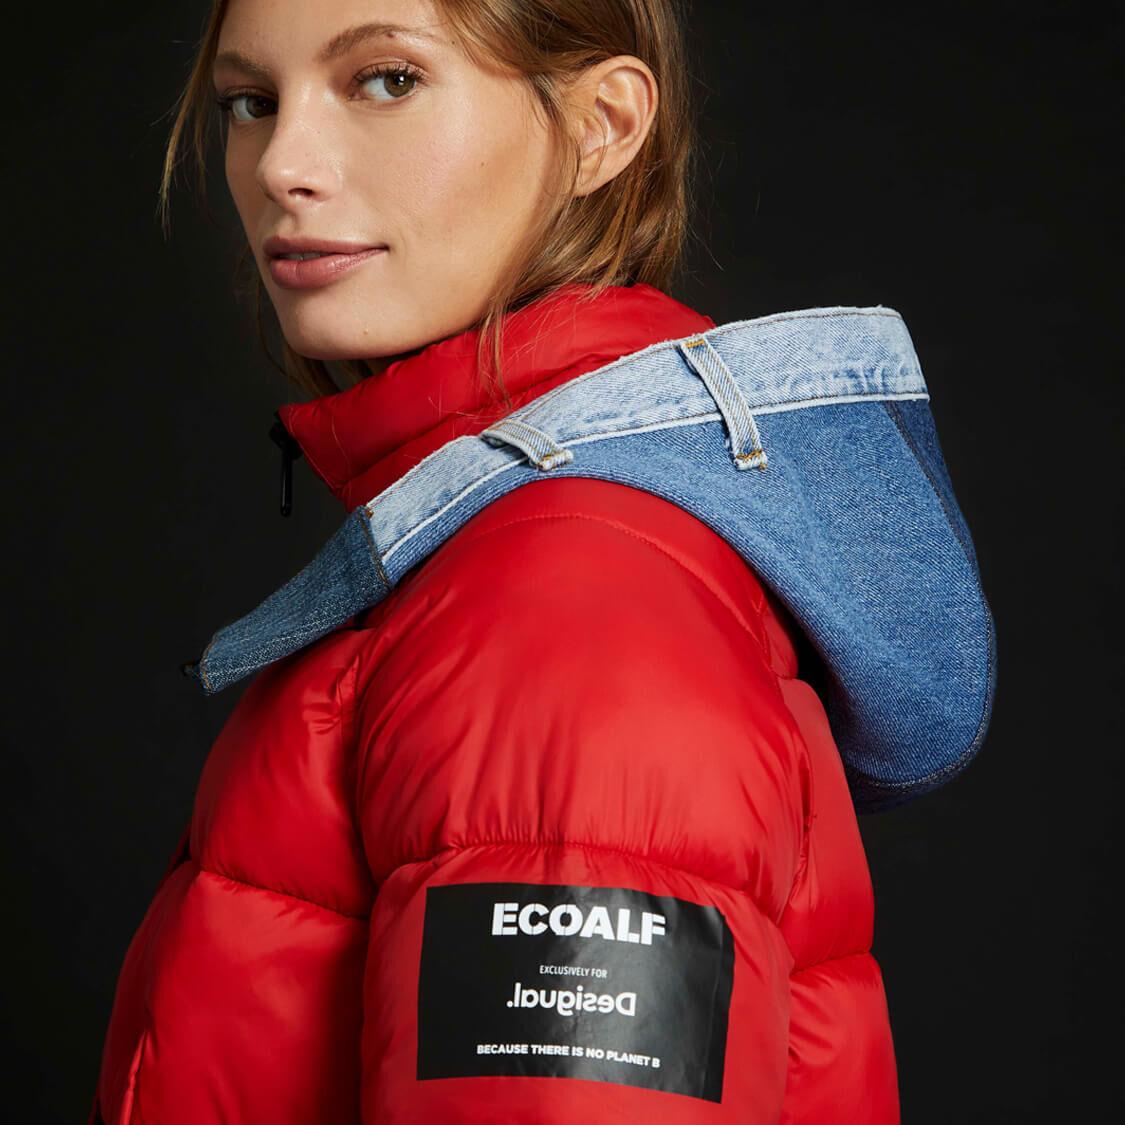 Recycle + Reinterpret + Reuse + Re-love = wrap up with Desigual ❤️ Ecoalf